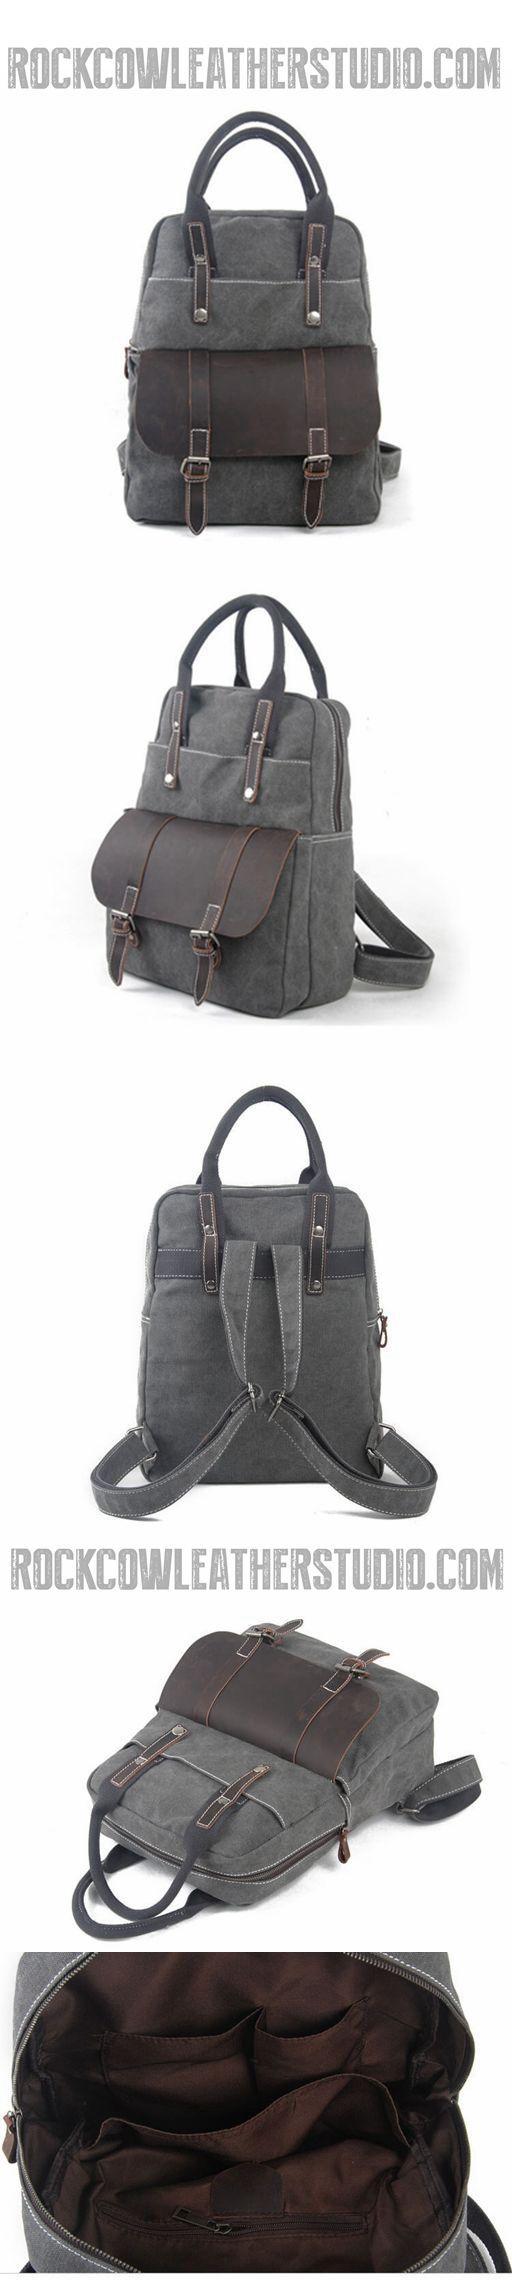 Waxed Canvas Backpack/Rucksack, Vintage School Backpack, Hiking Travel Backpack 1022